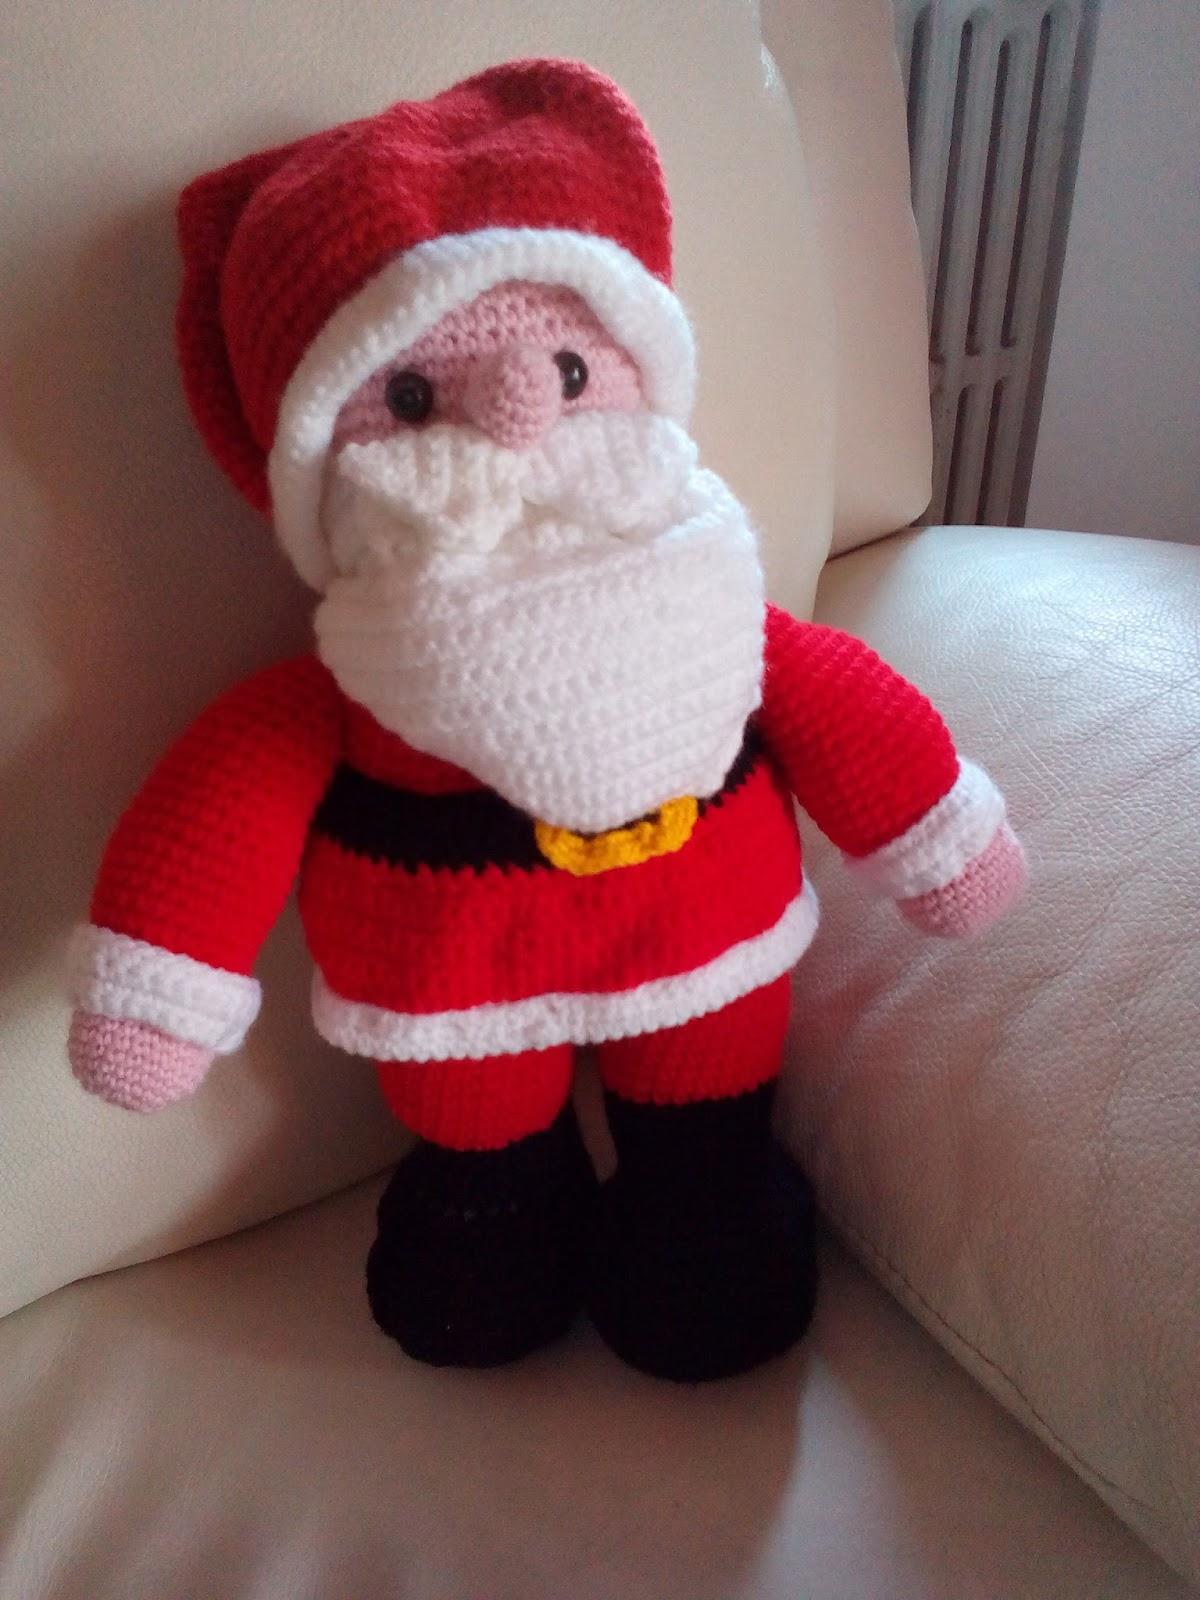 Babbo Natale Uncinetto amigurumi schema italiano - manifantasia | 1600x1200